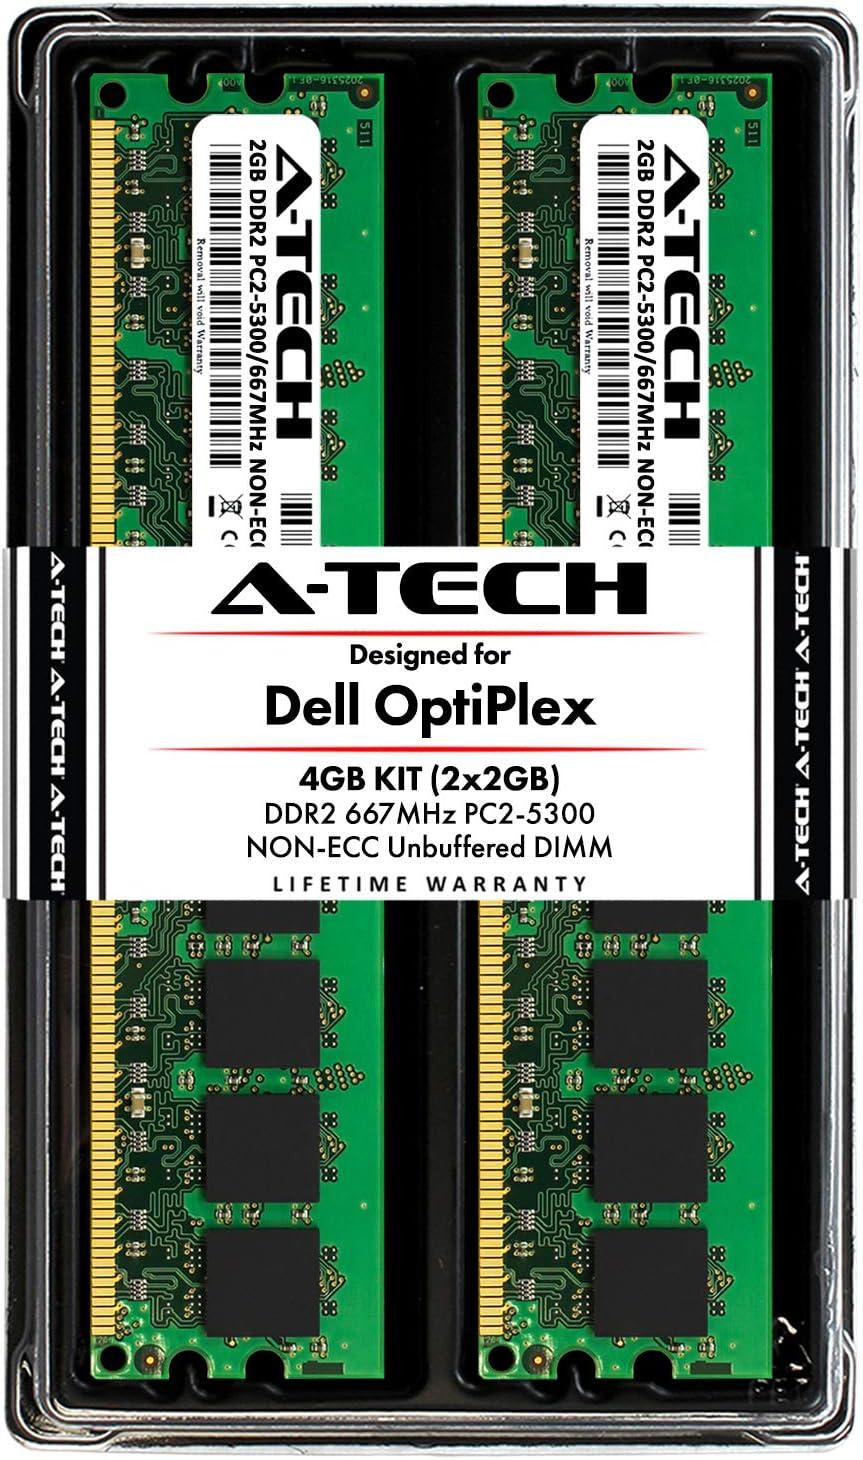 A-Tech 4GB (2X 2GB) Memory RAM Kit for Dell OptiPlex 755, 745, 740, GX620, GX520, 360, 330, 160, FX160, (MT, DT, SFF, USFF) - DDR2 667MHz PC2-5300 Non-ECC DIMM Modules